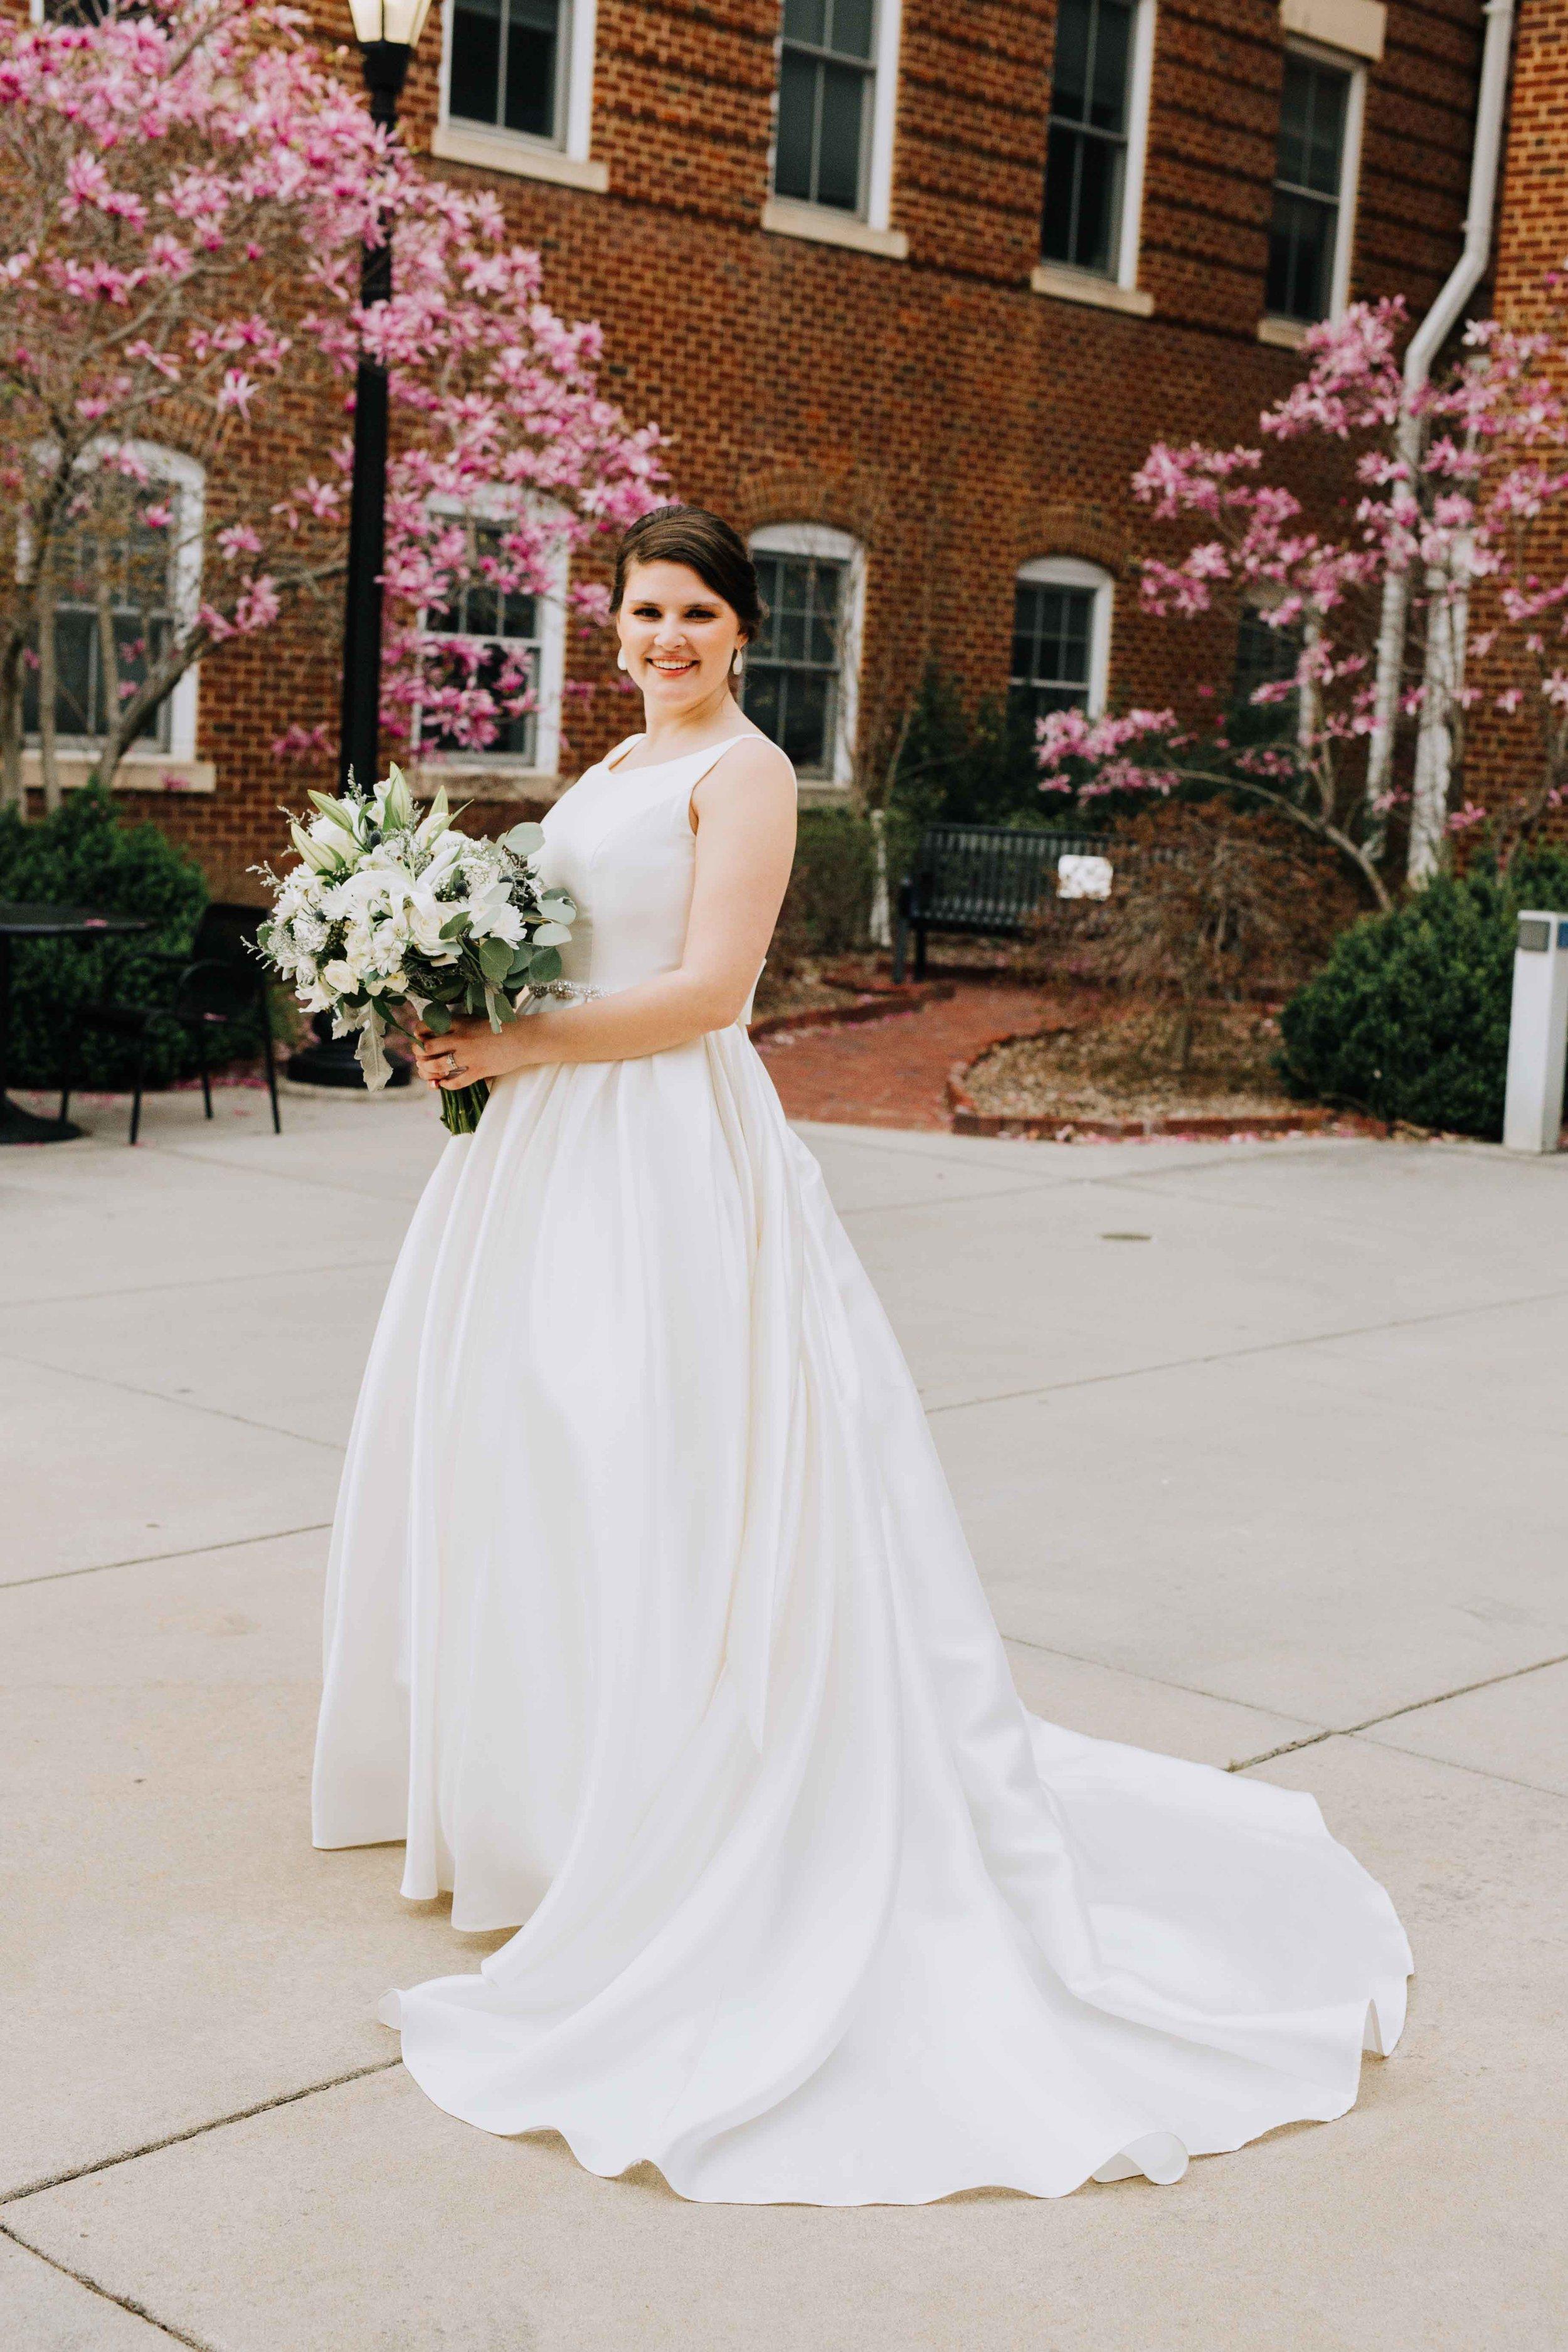 Farmville-Virginia-Wedding-Hotel-Weynoke-Downtown-Jacqueline-Waters-Photography-Detailed- (1249).jpg